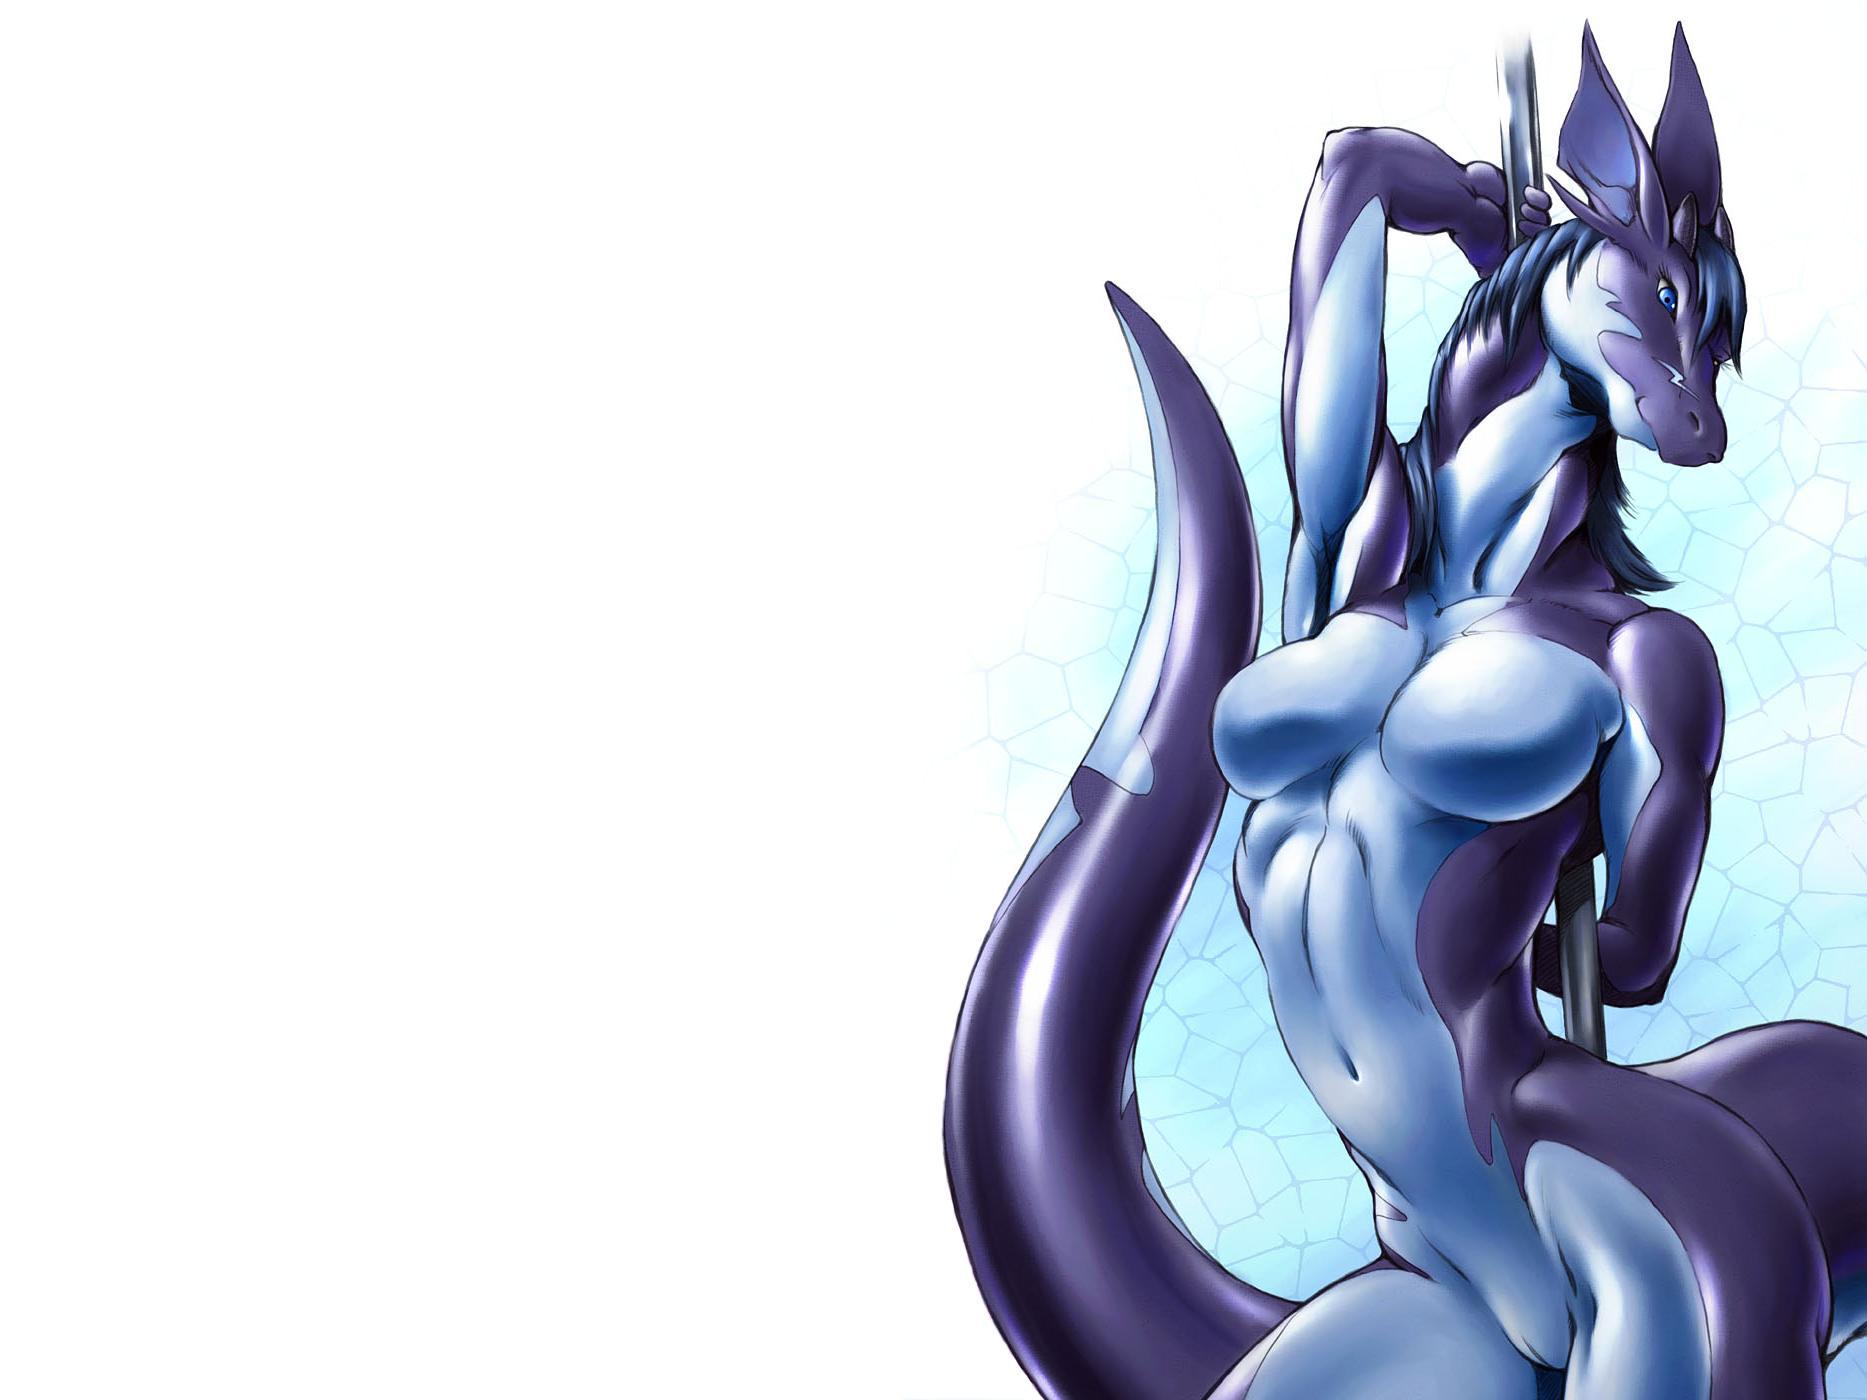 Фурри дракон порно 20 фотография